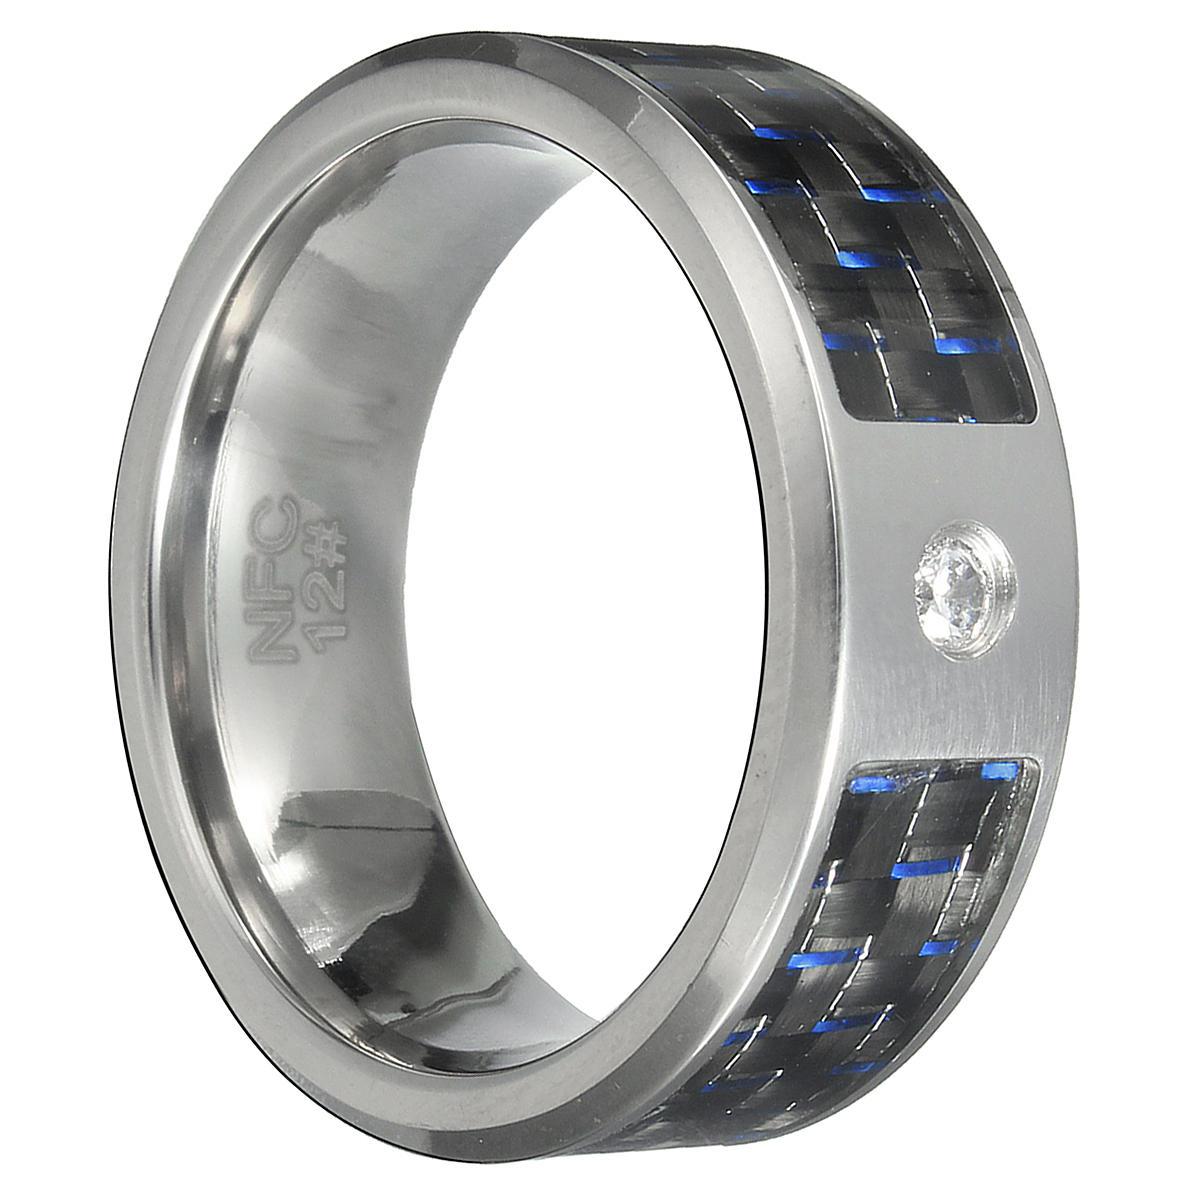 Smart Rings Magic Wear cincin NFC Untuk Android Windows NFC Ponsel